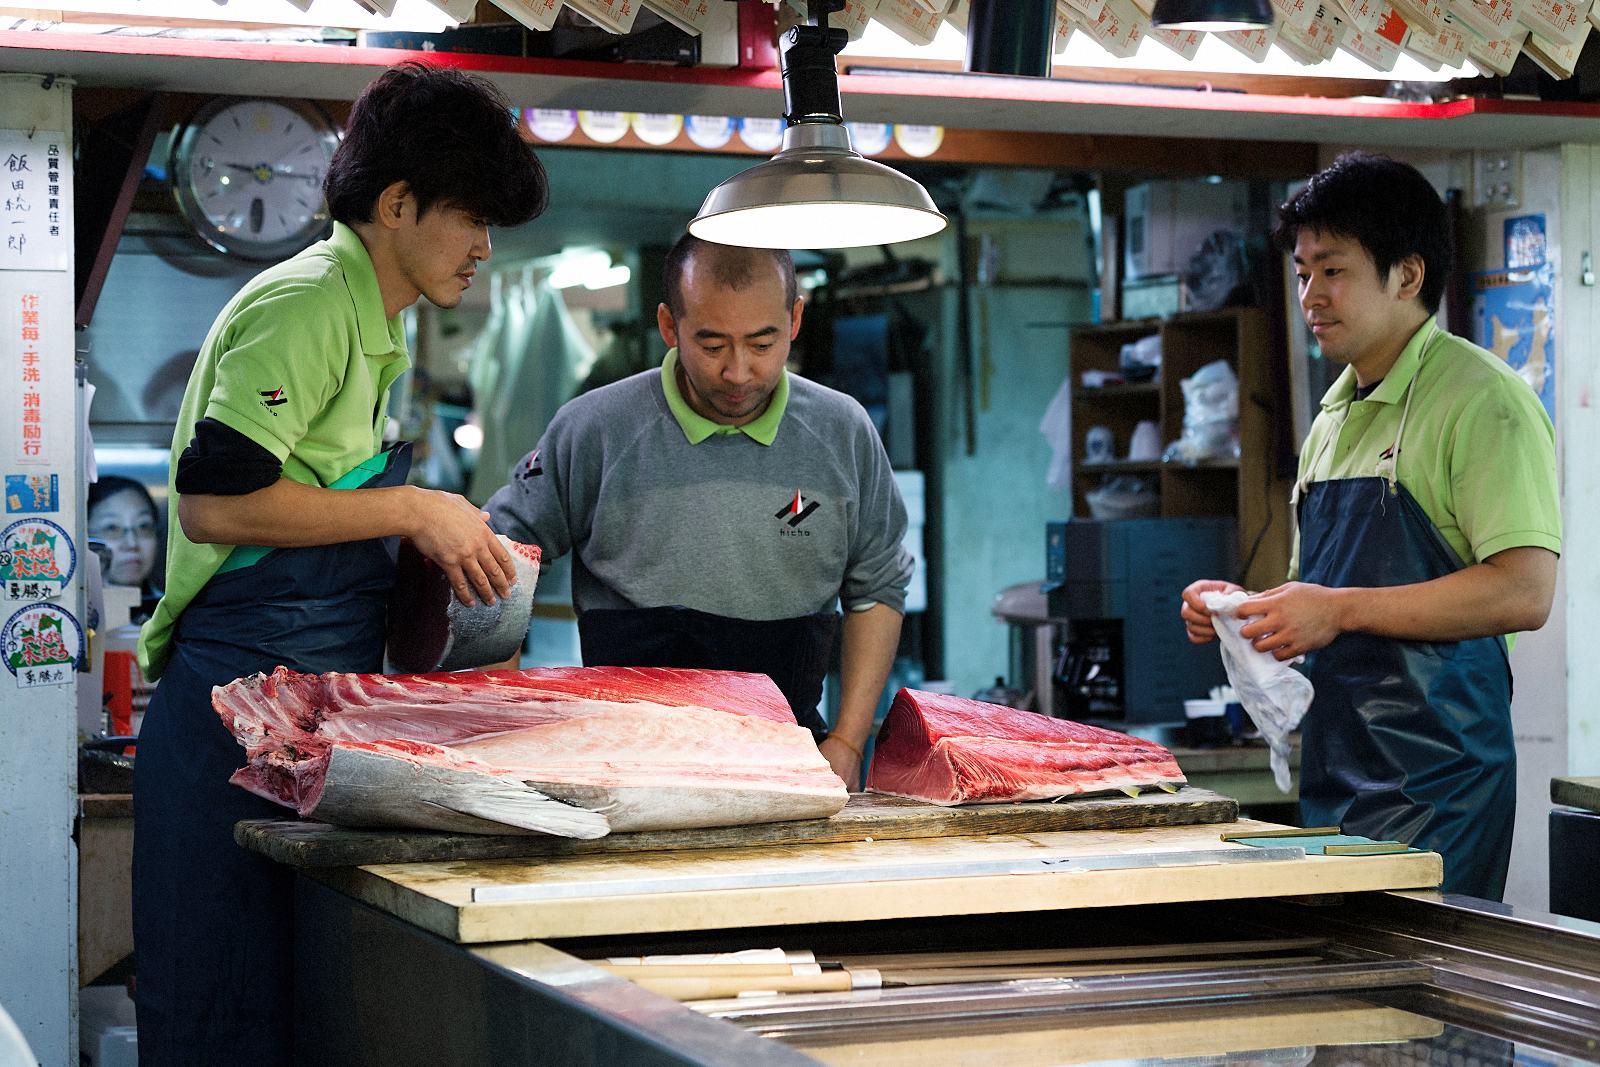 KatSchleicher_Tsukiji003.jpg